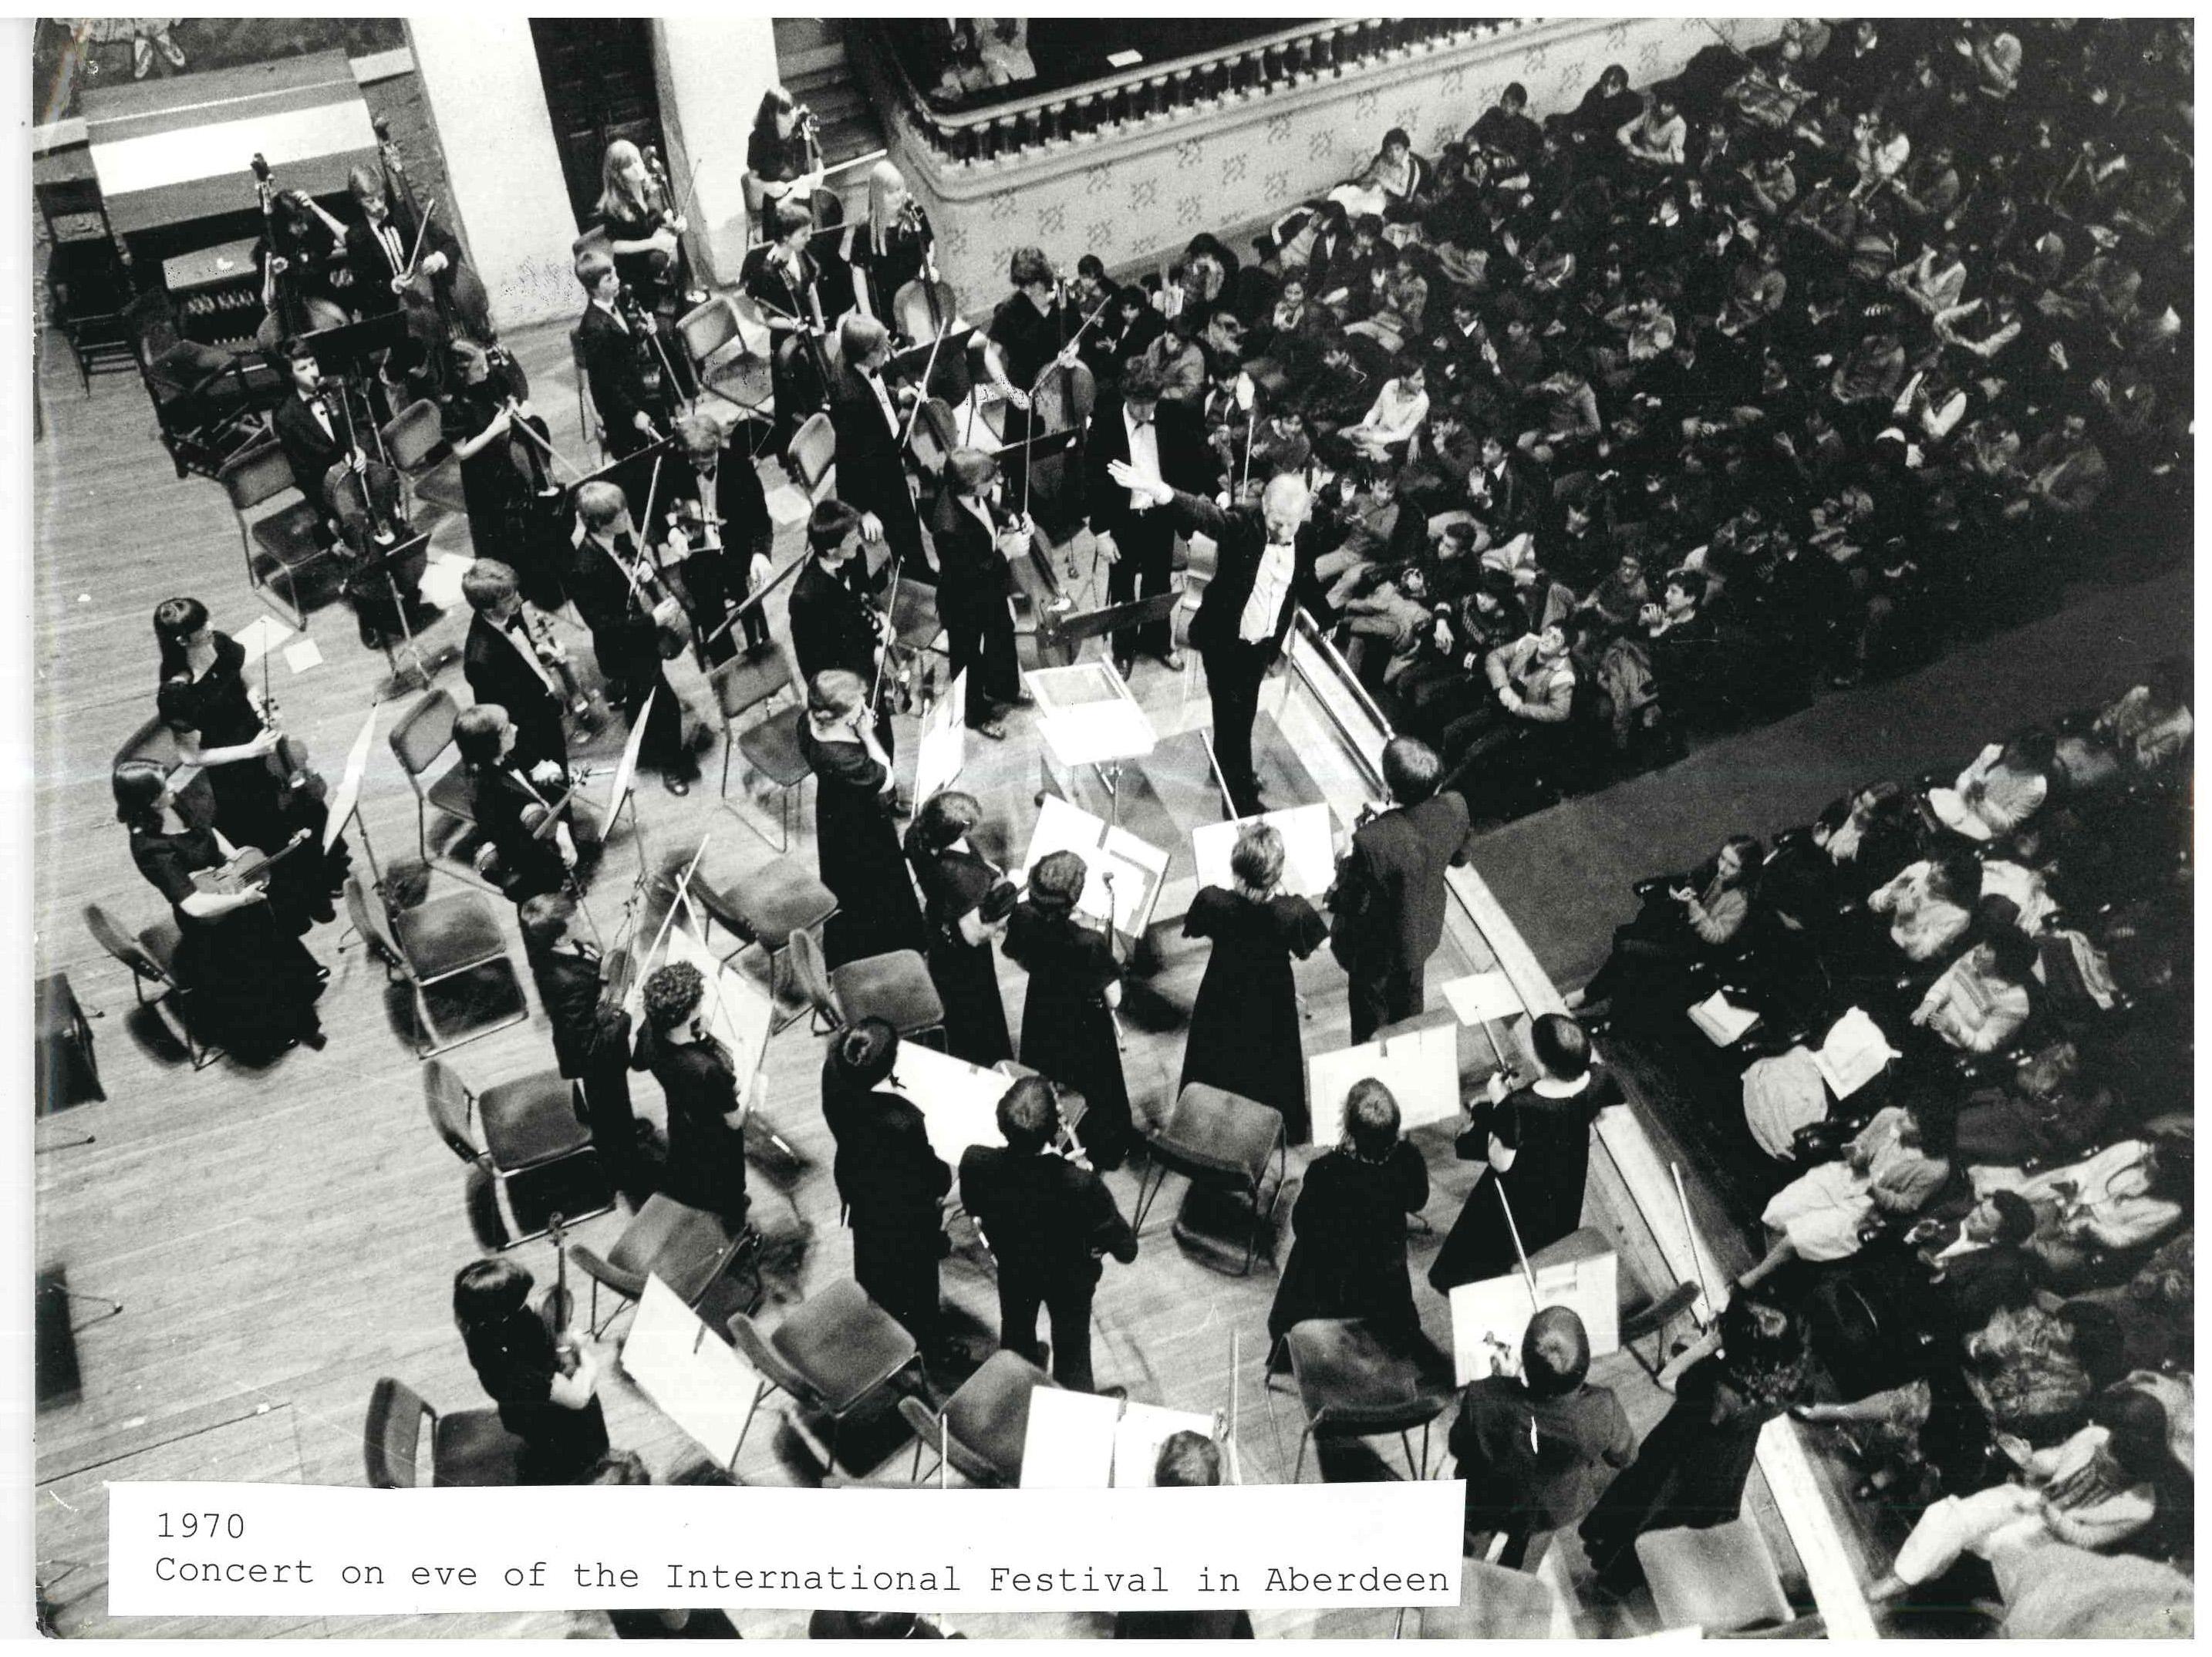 00151-Barcelona 1982 (8).jpg